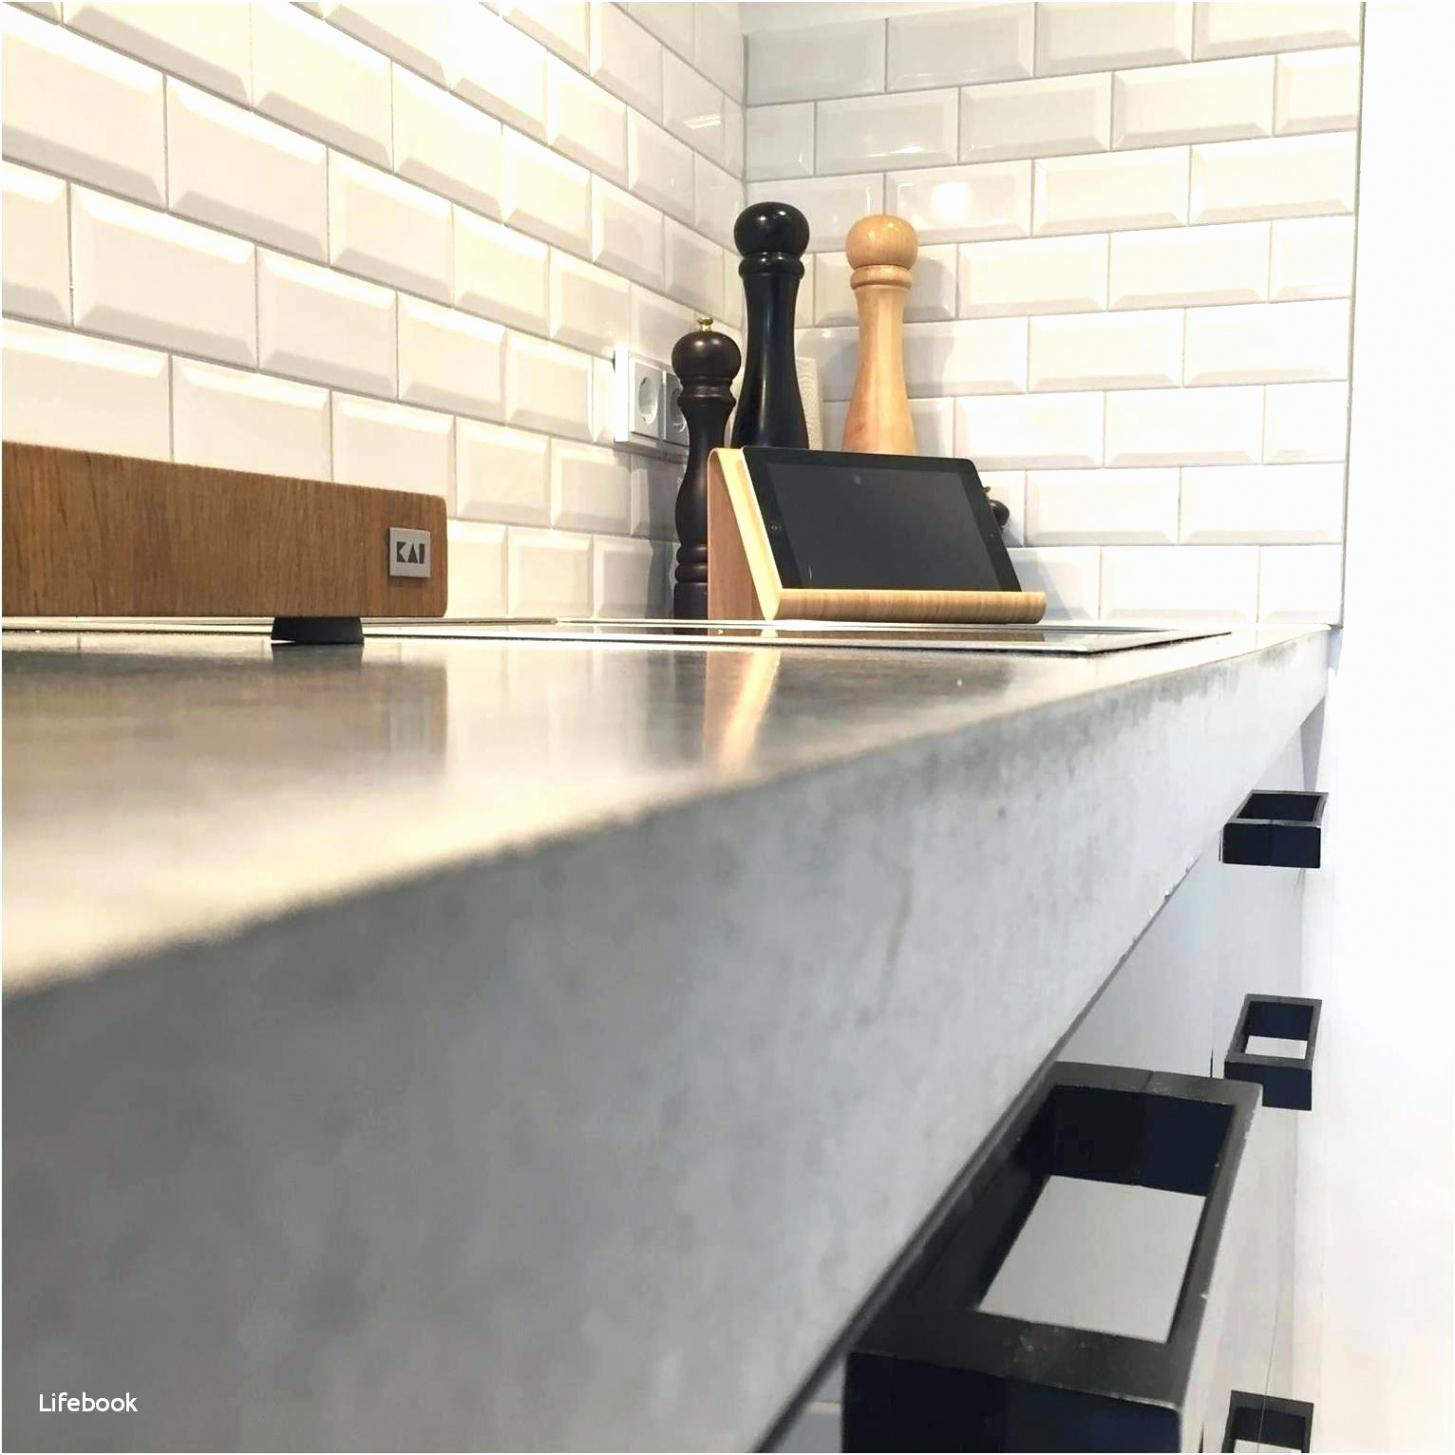 arbeitsplatte aus beton neu arbeitsplatte beton mobel ideen site arbeitsplatte aus beton arbeitsplatte aus beton